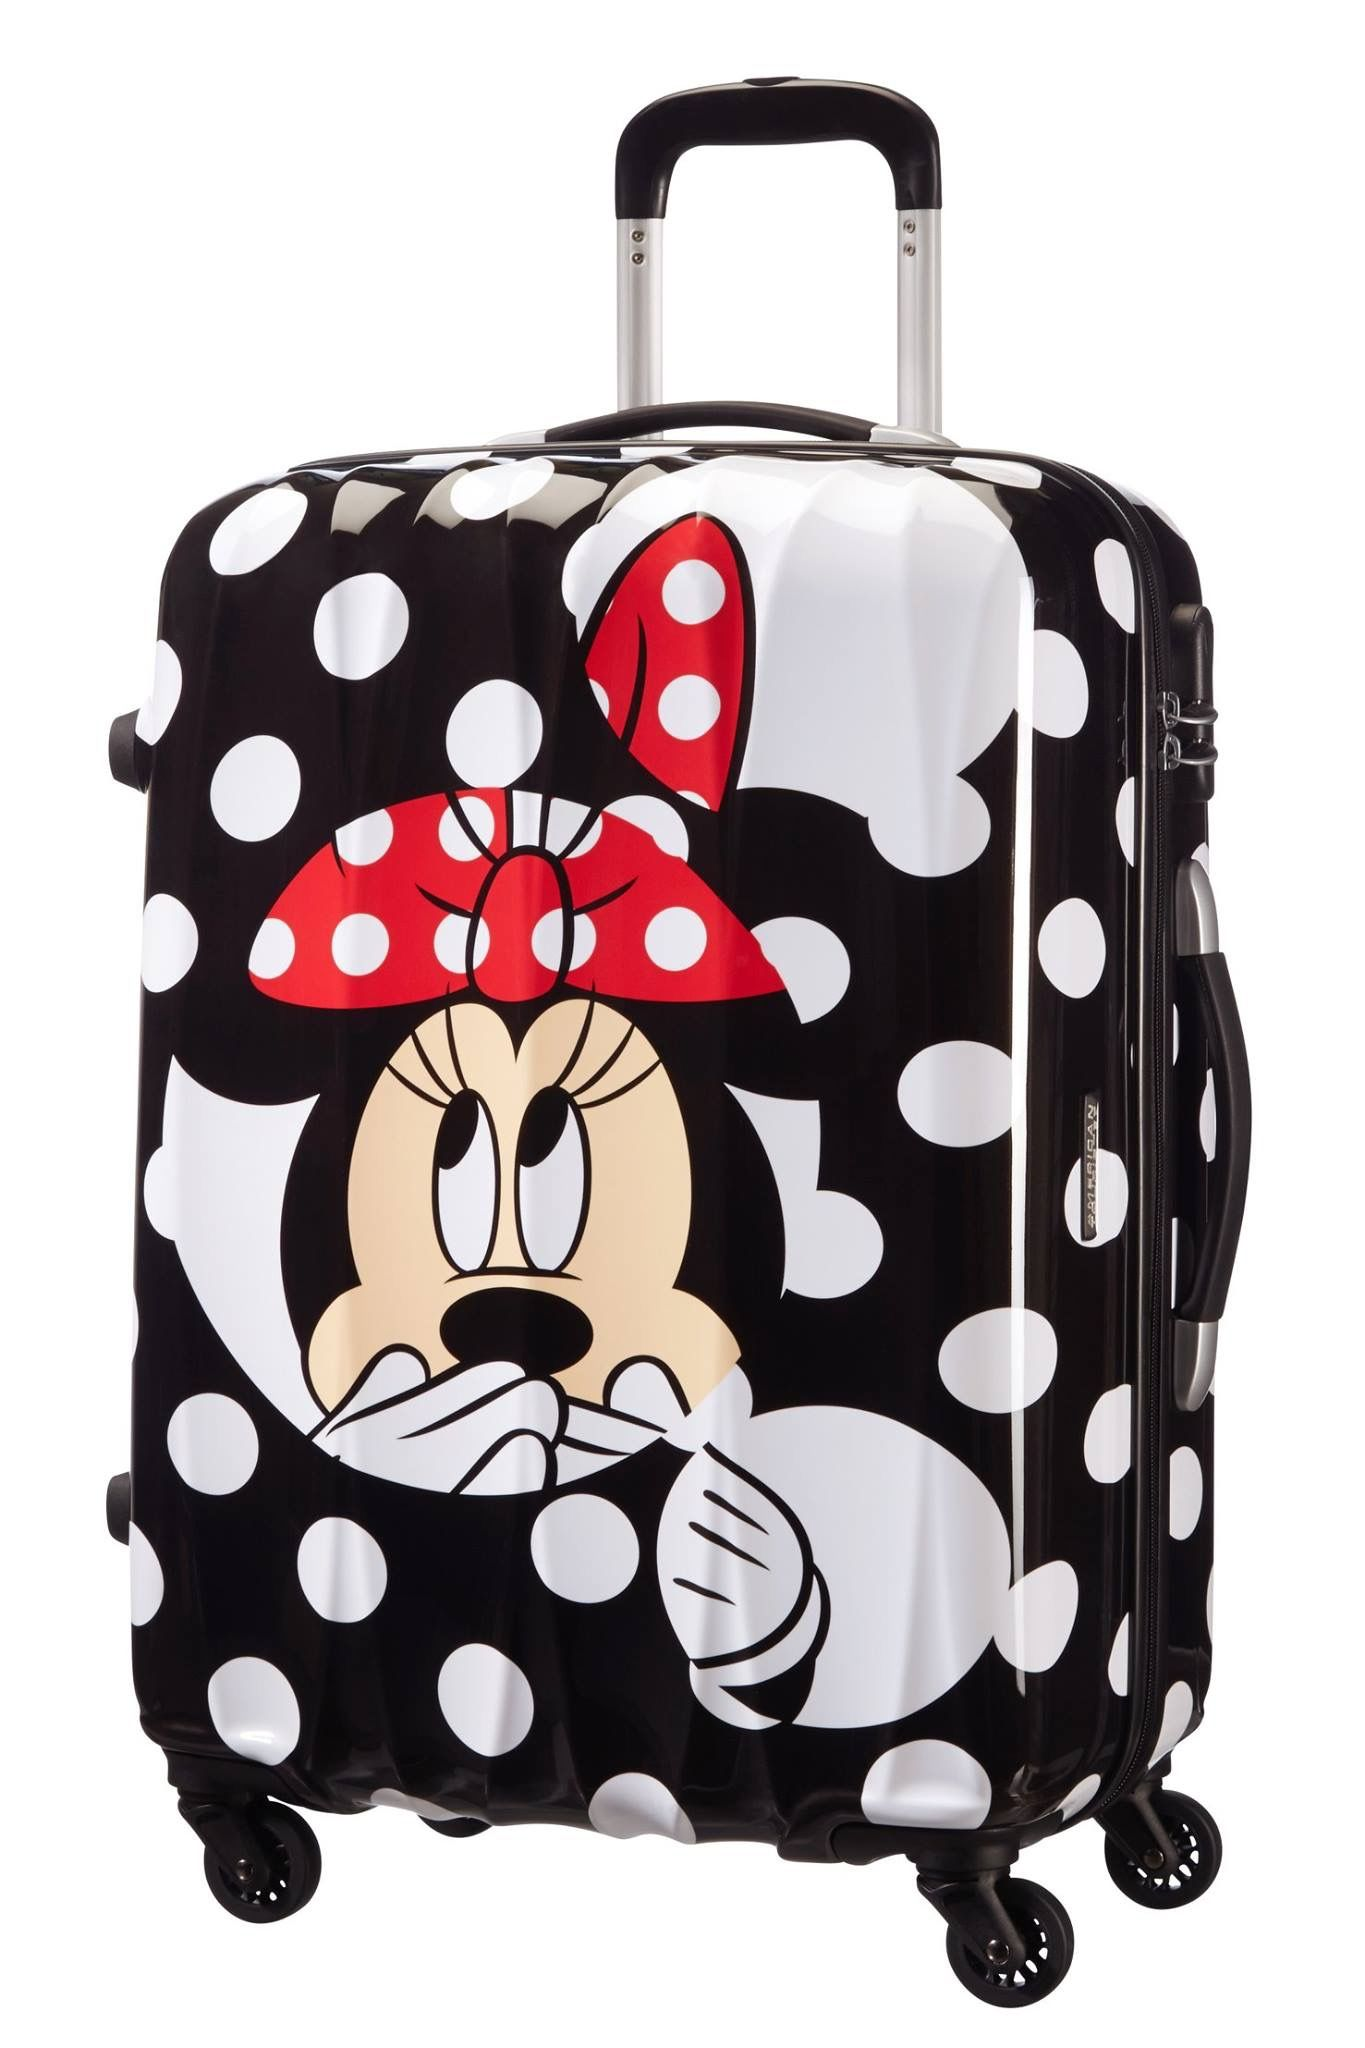 6143a2a1d2 So cute Disney Luggage